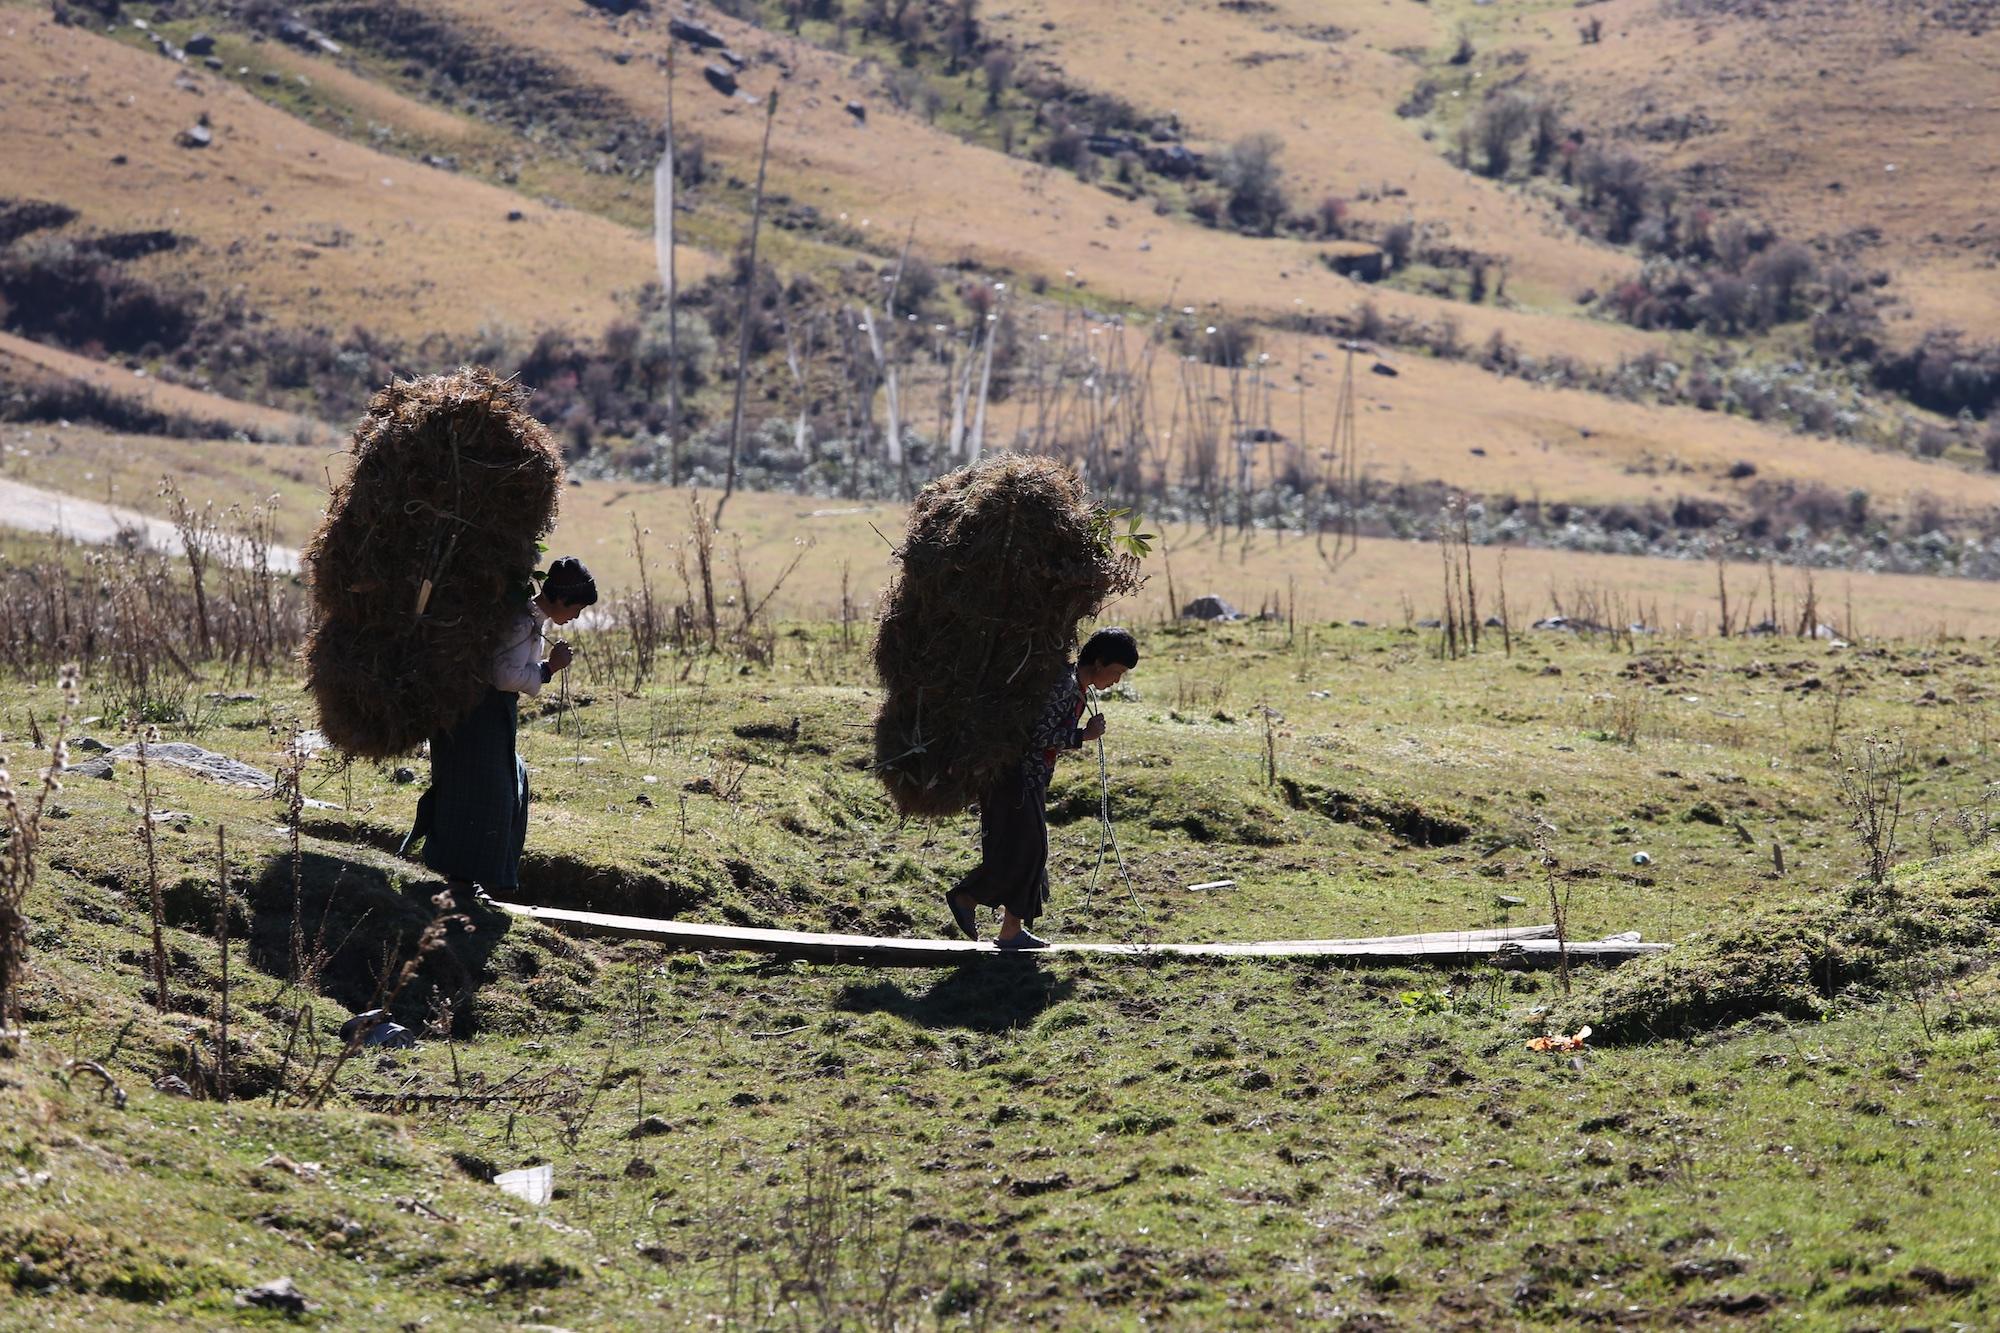 Bhutan-2016- C26O9877.jpg